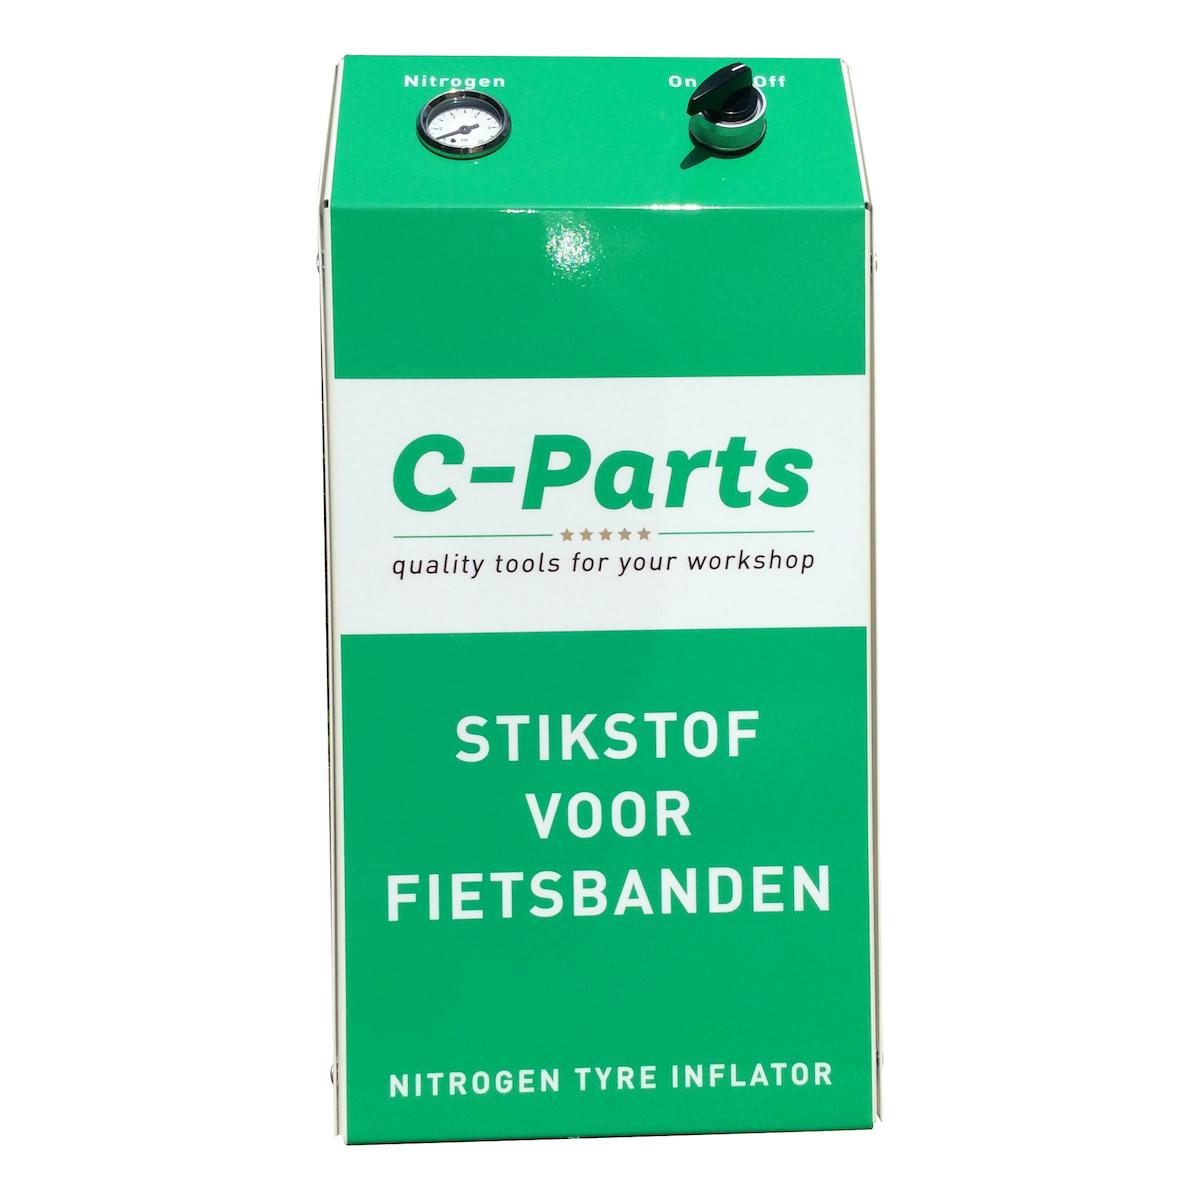 C-Parts stikstof generator